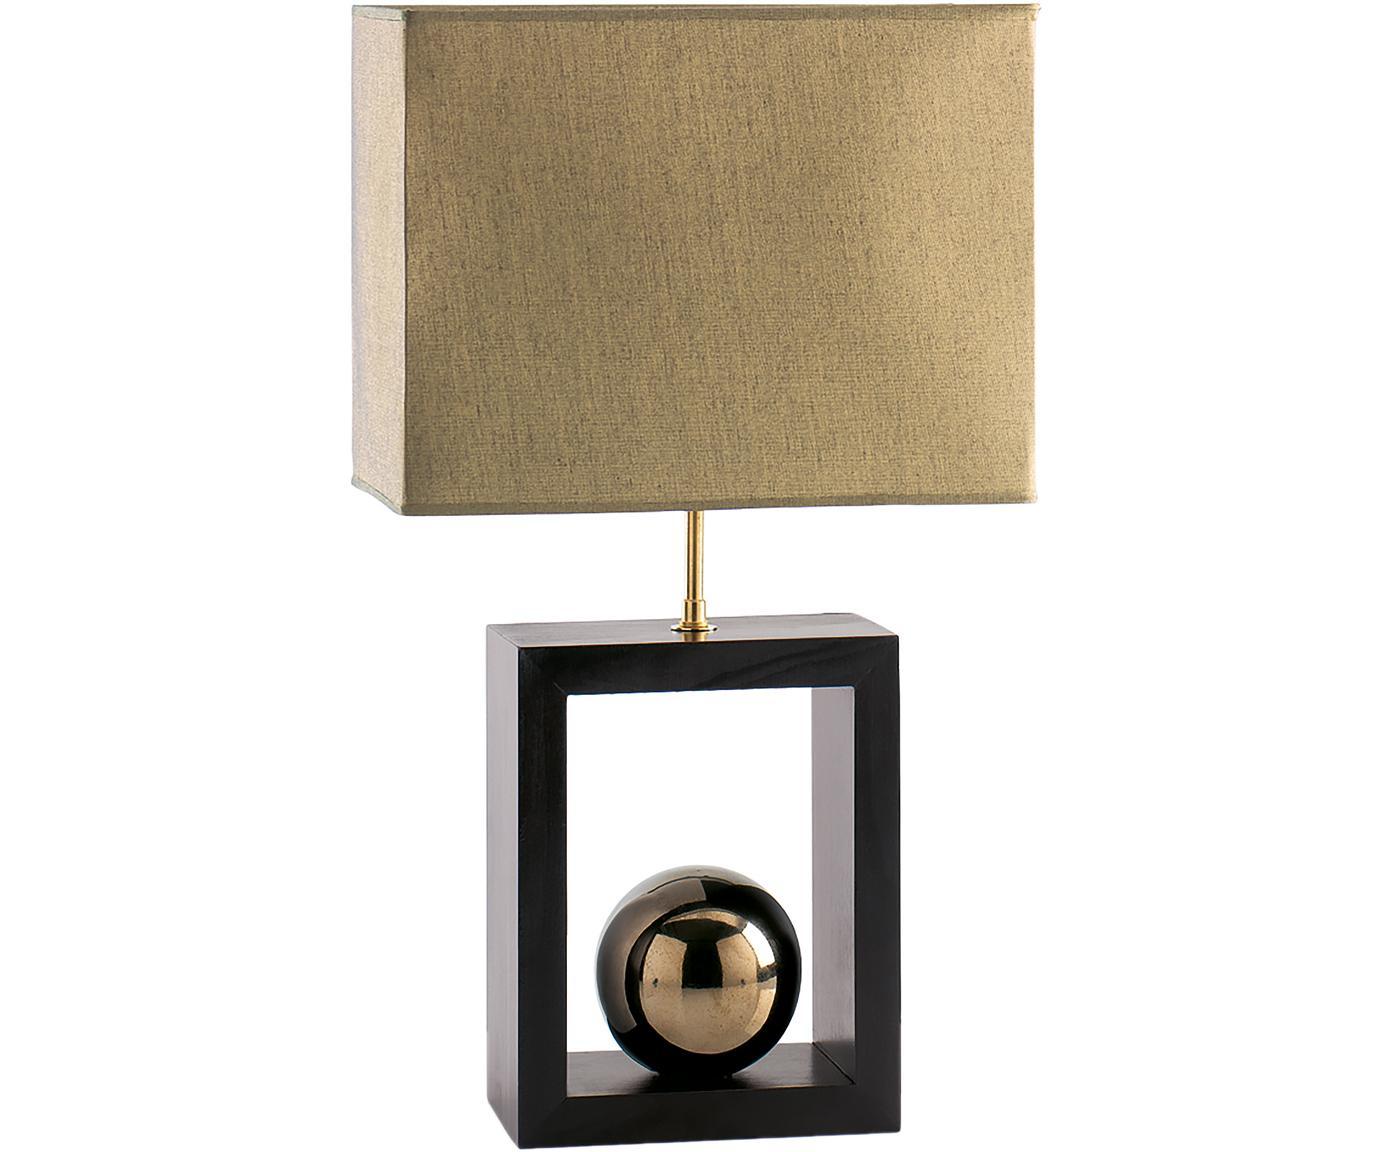 Tafellamp Scala van beukenhout, Lampenkap: polyester, Lampvoet: gelakt beukenhout, Goudkleurig, bruin, 30 x 54 cm